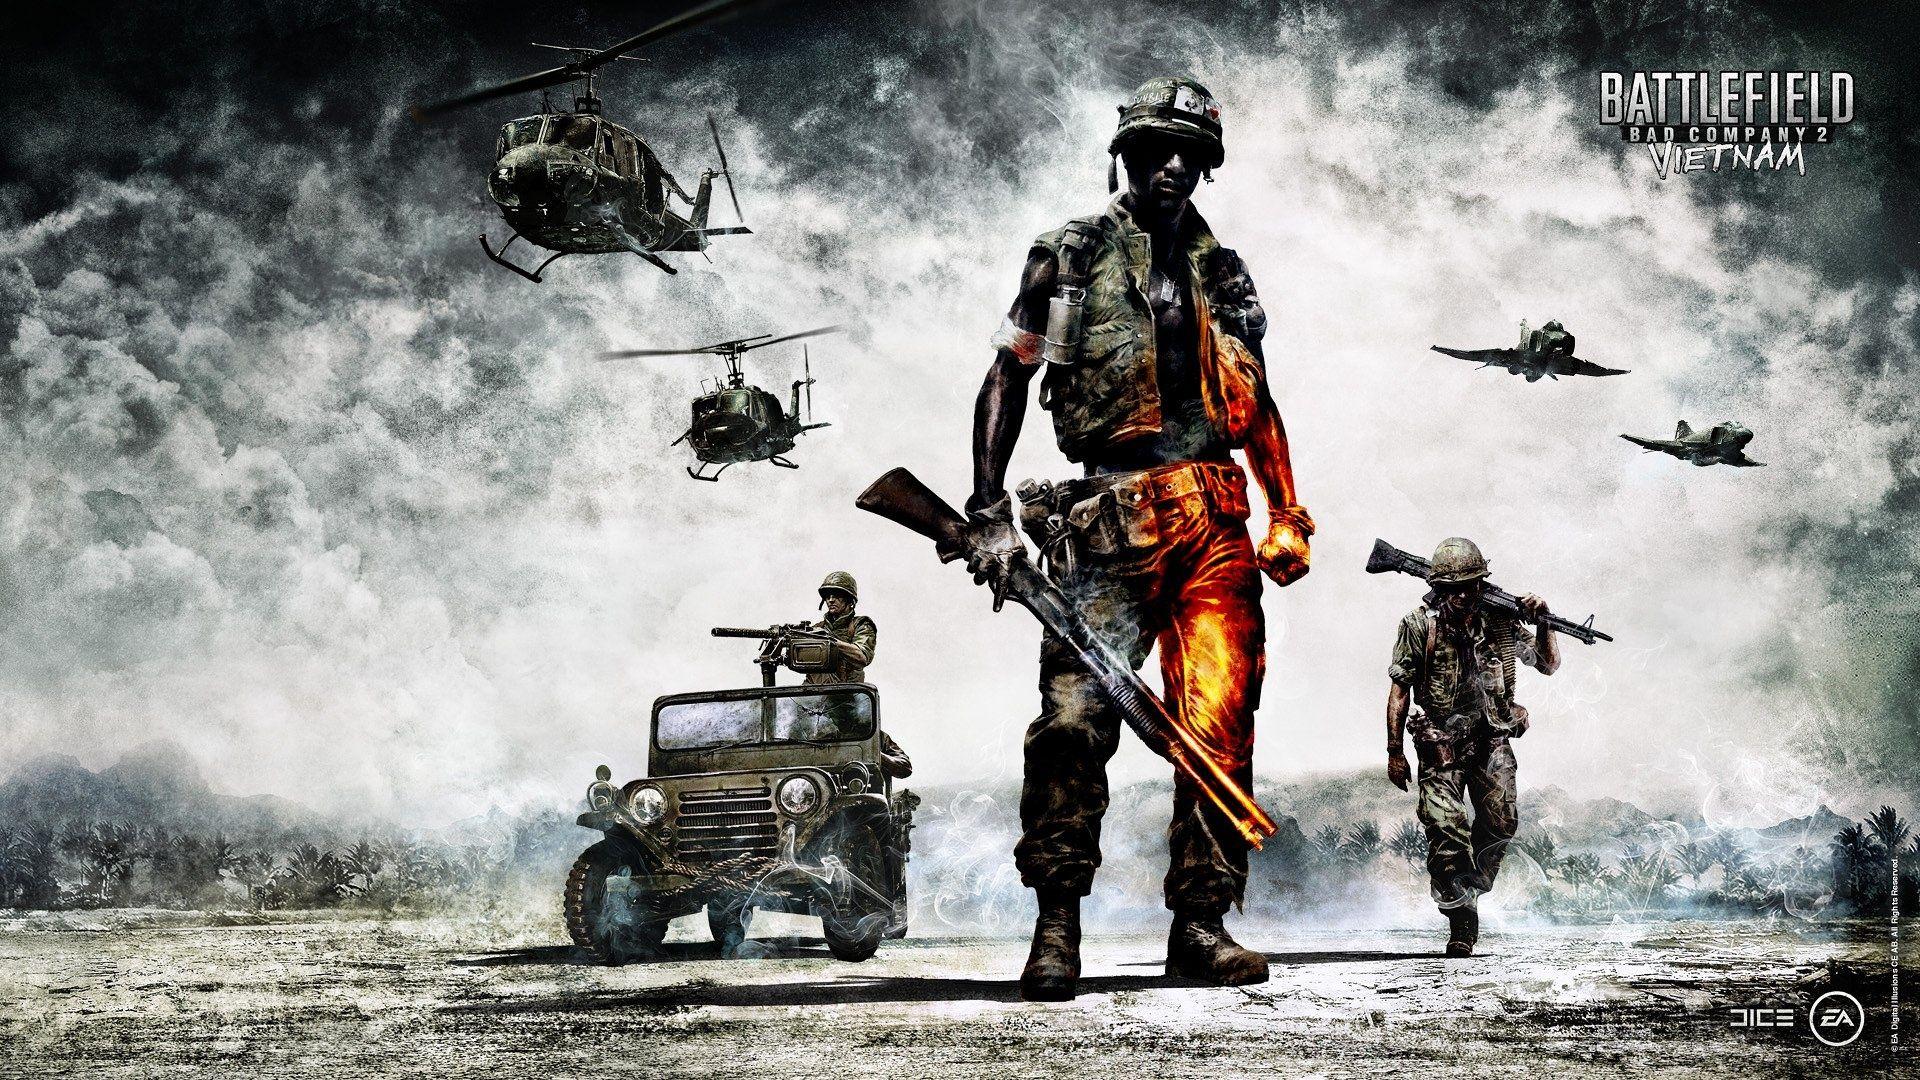 Battlefield Bad Company 2 Vietnam Pc Battlefield Bad Company